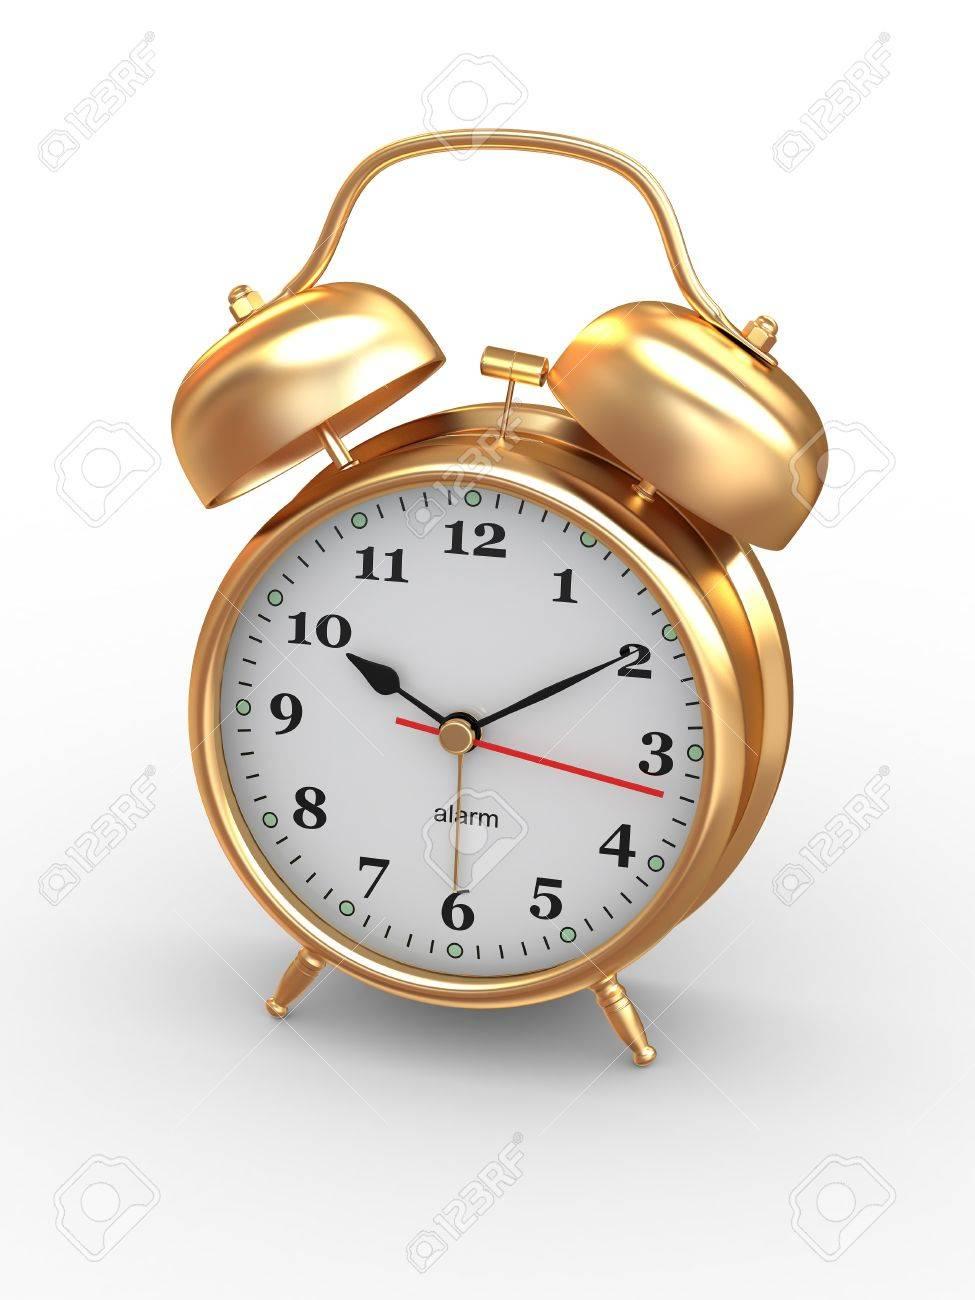 Fullsize Of Old Fashioned Alarm Clock